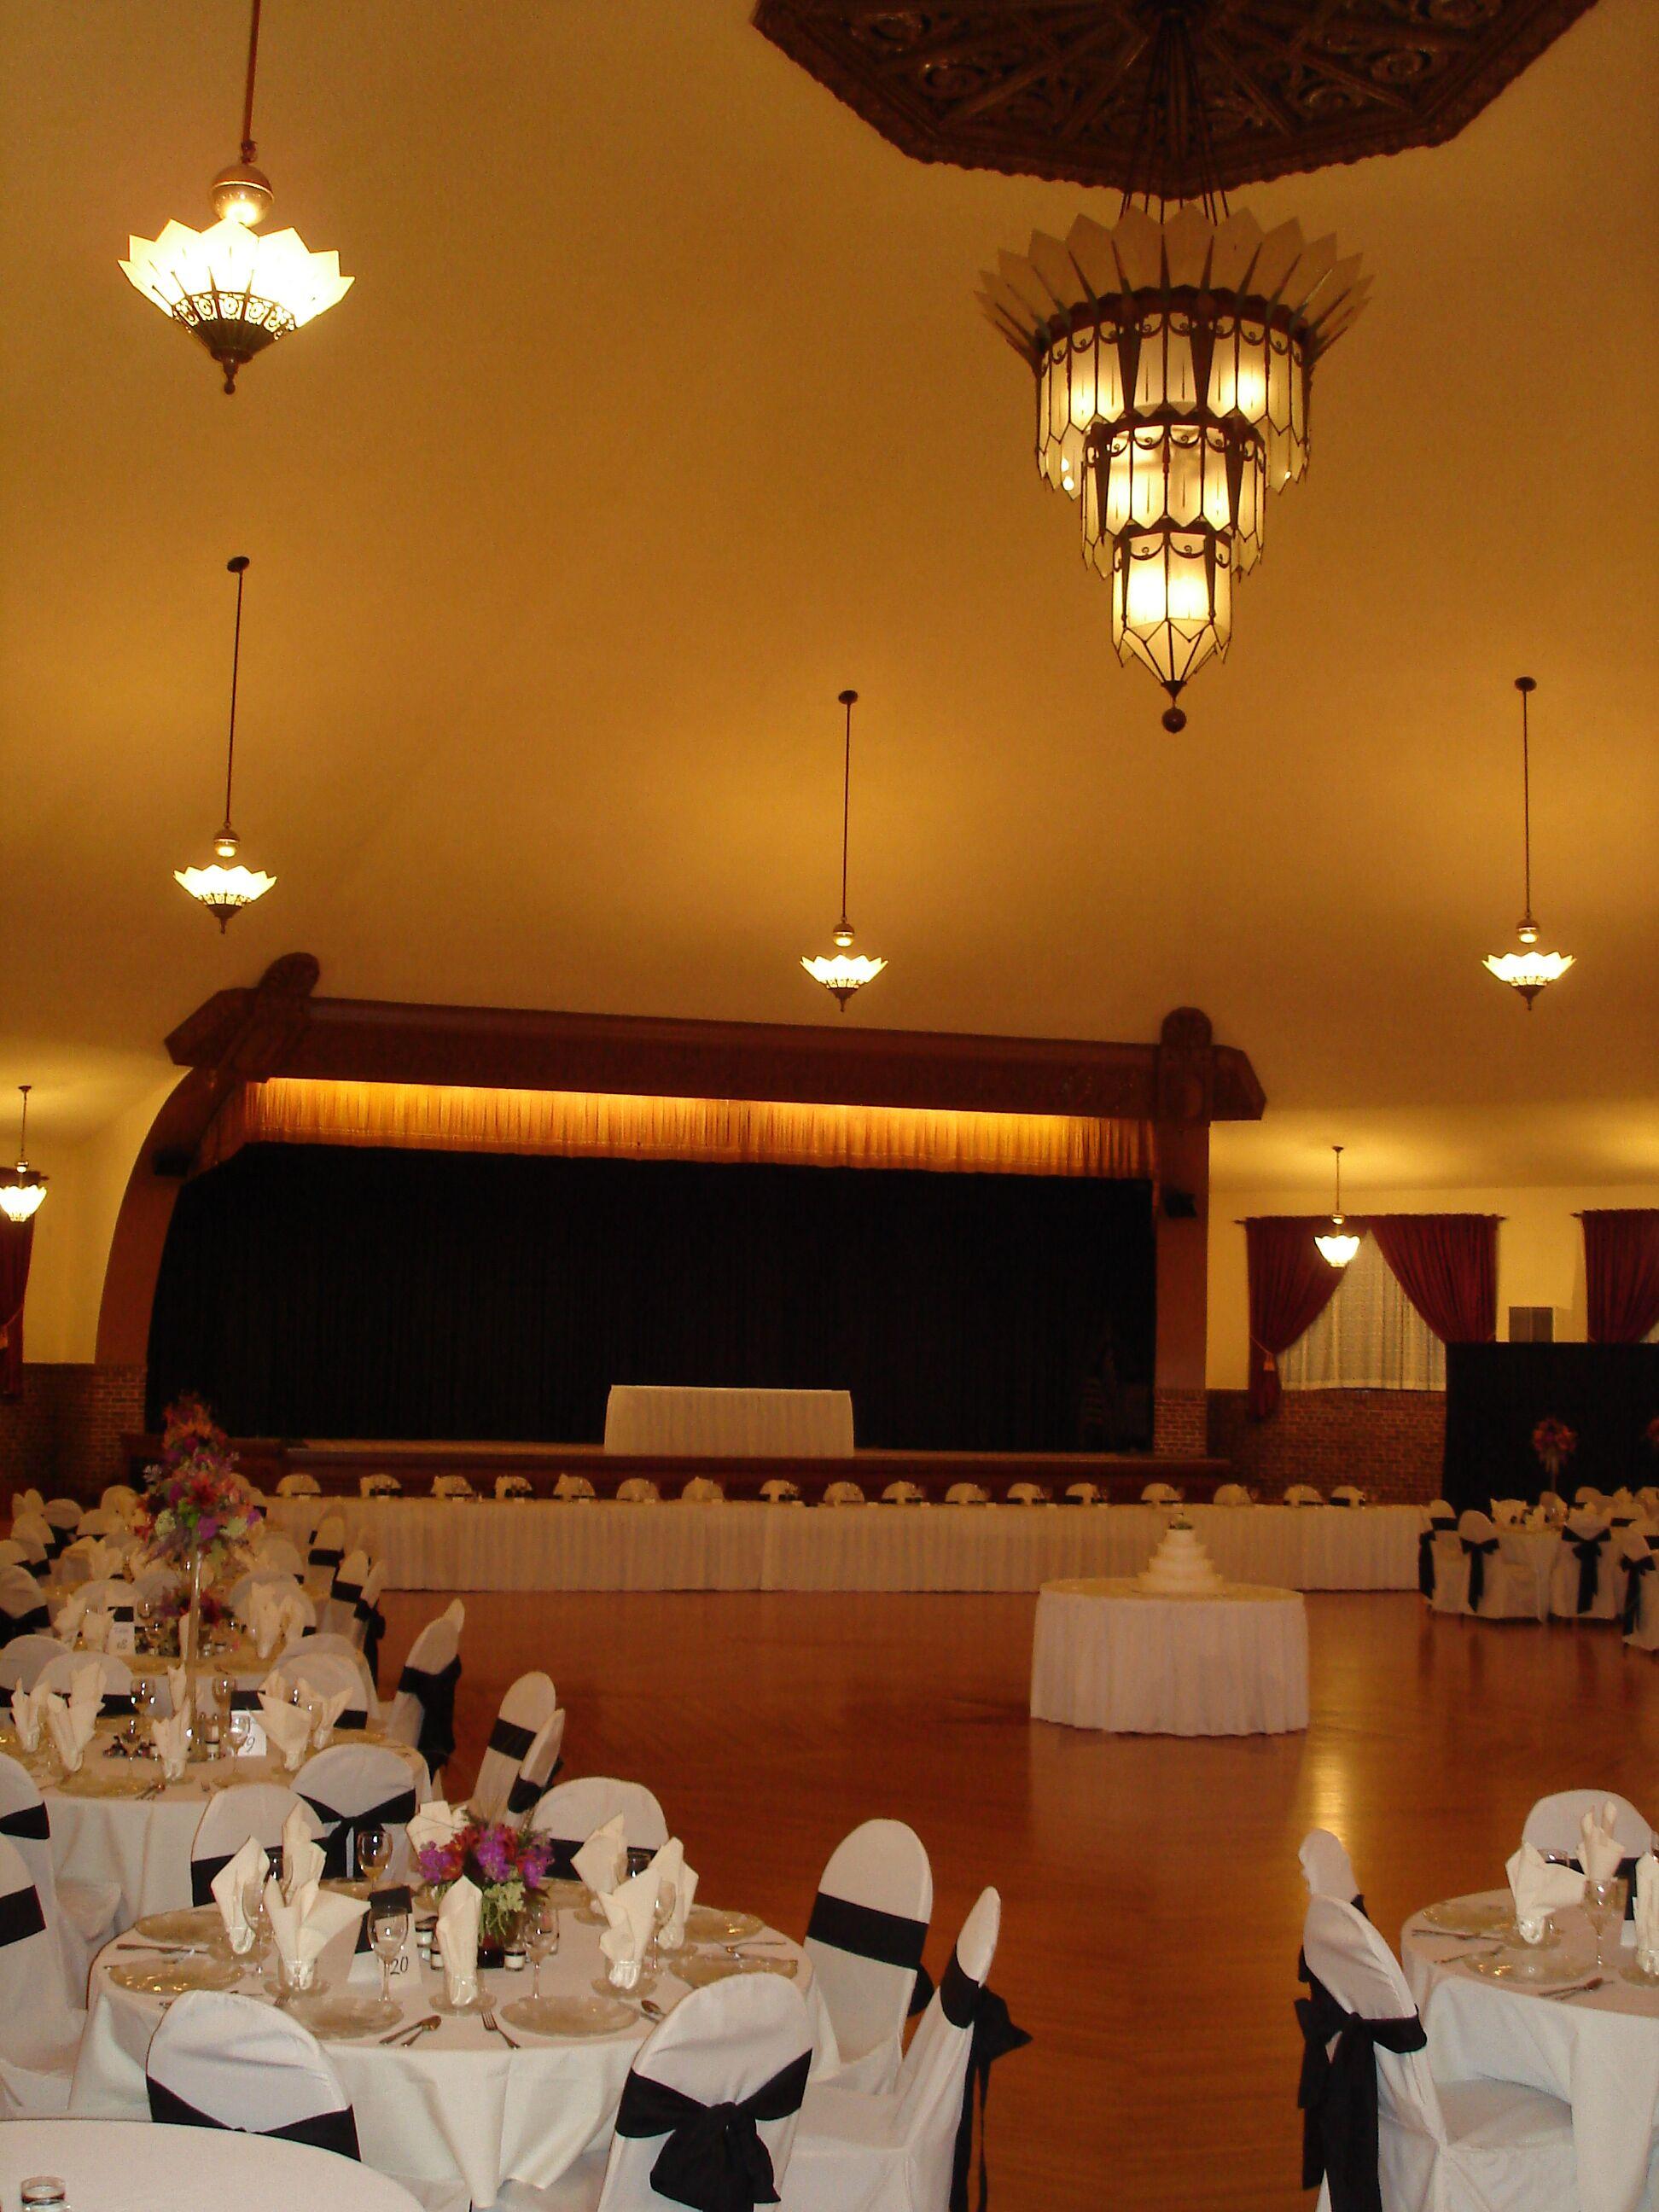 Chandelier Ballroom Hartford WI